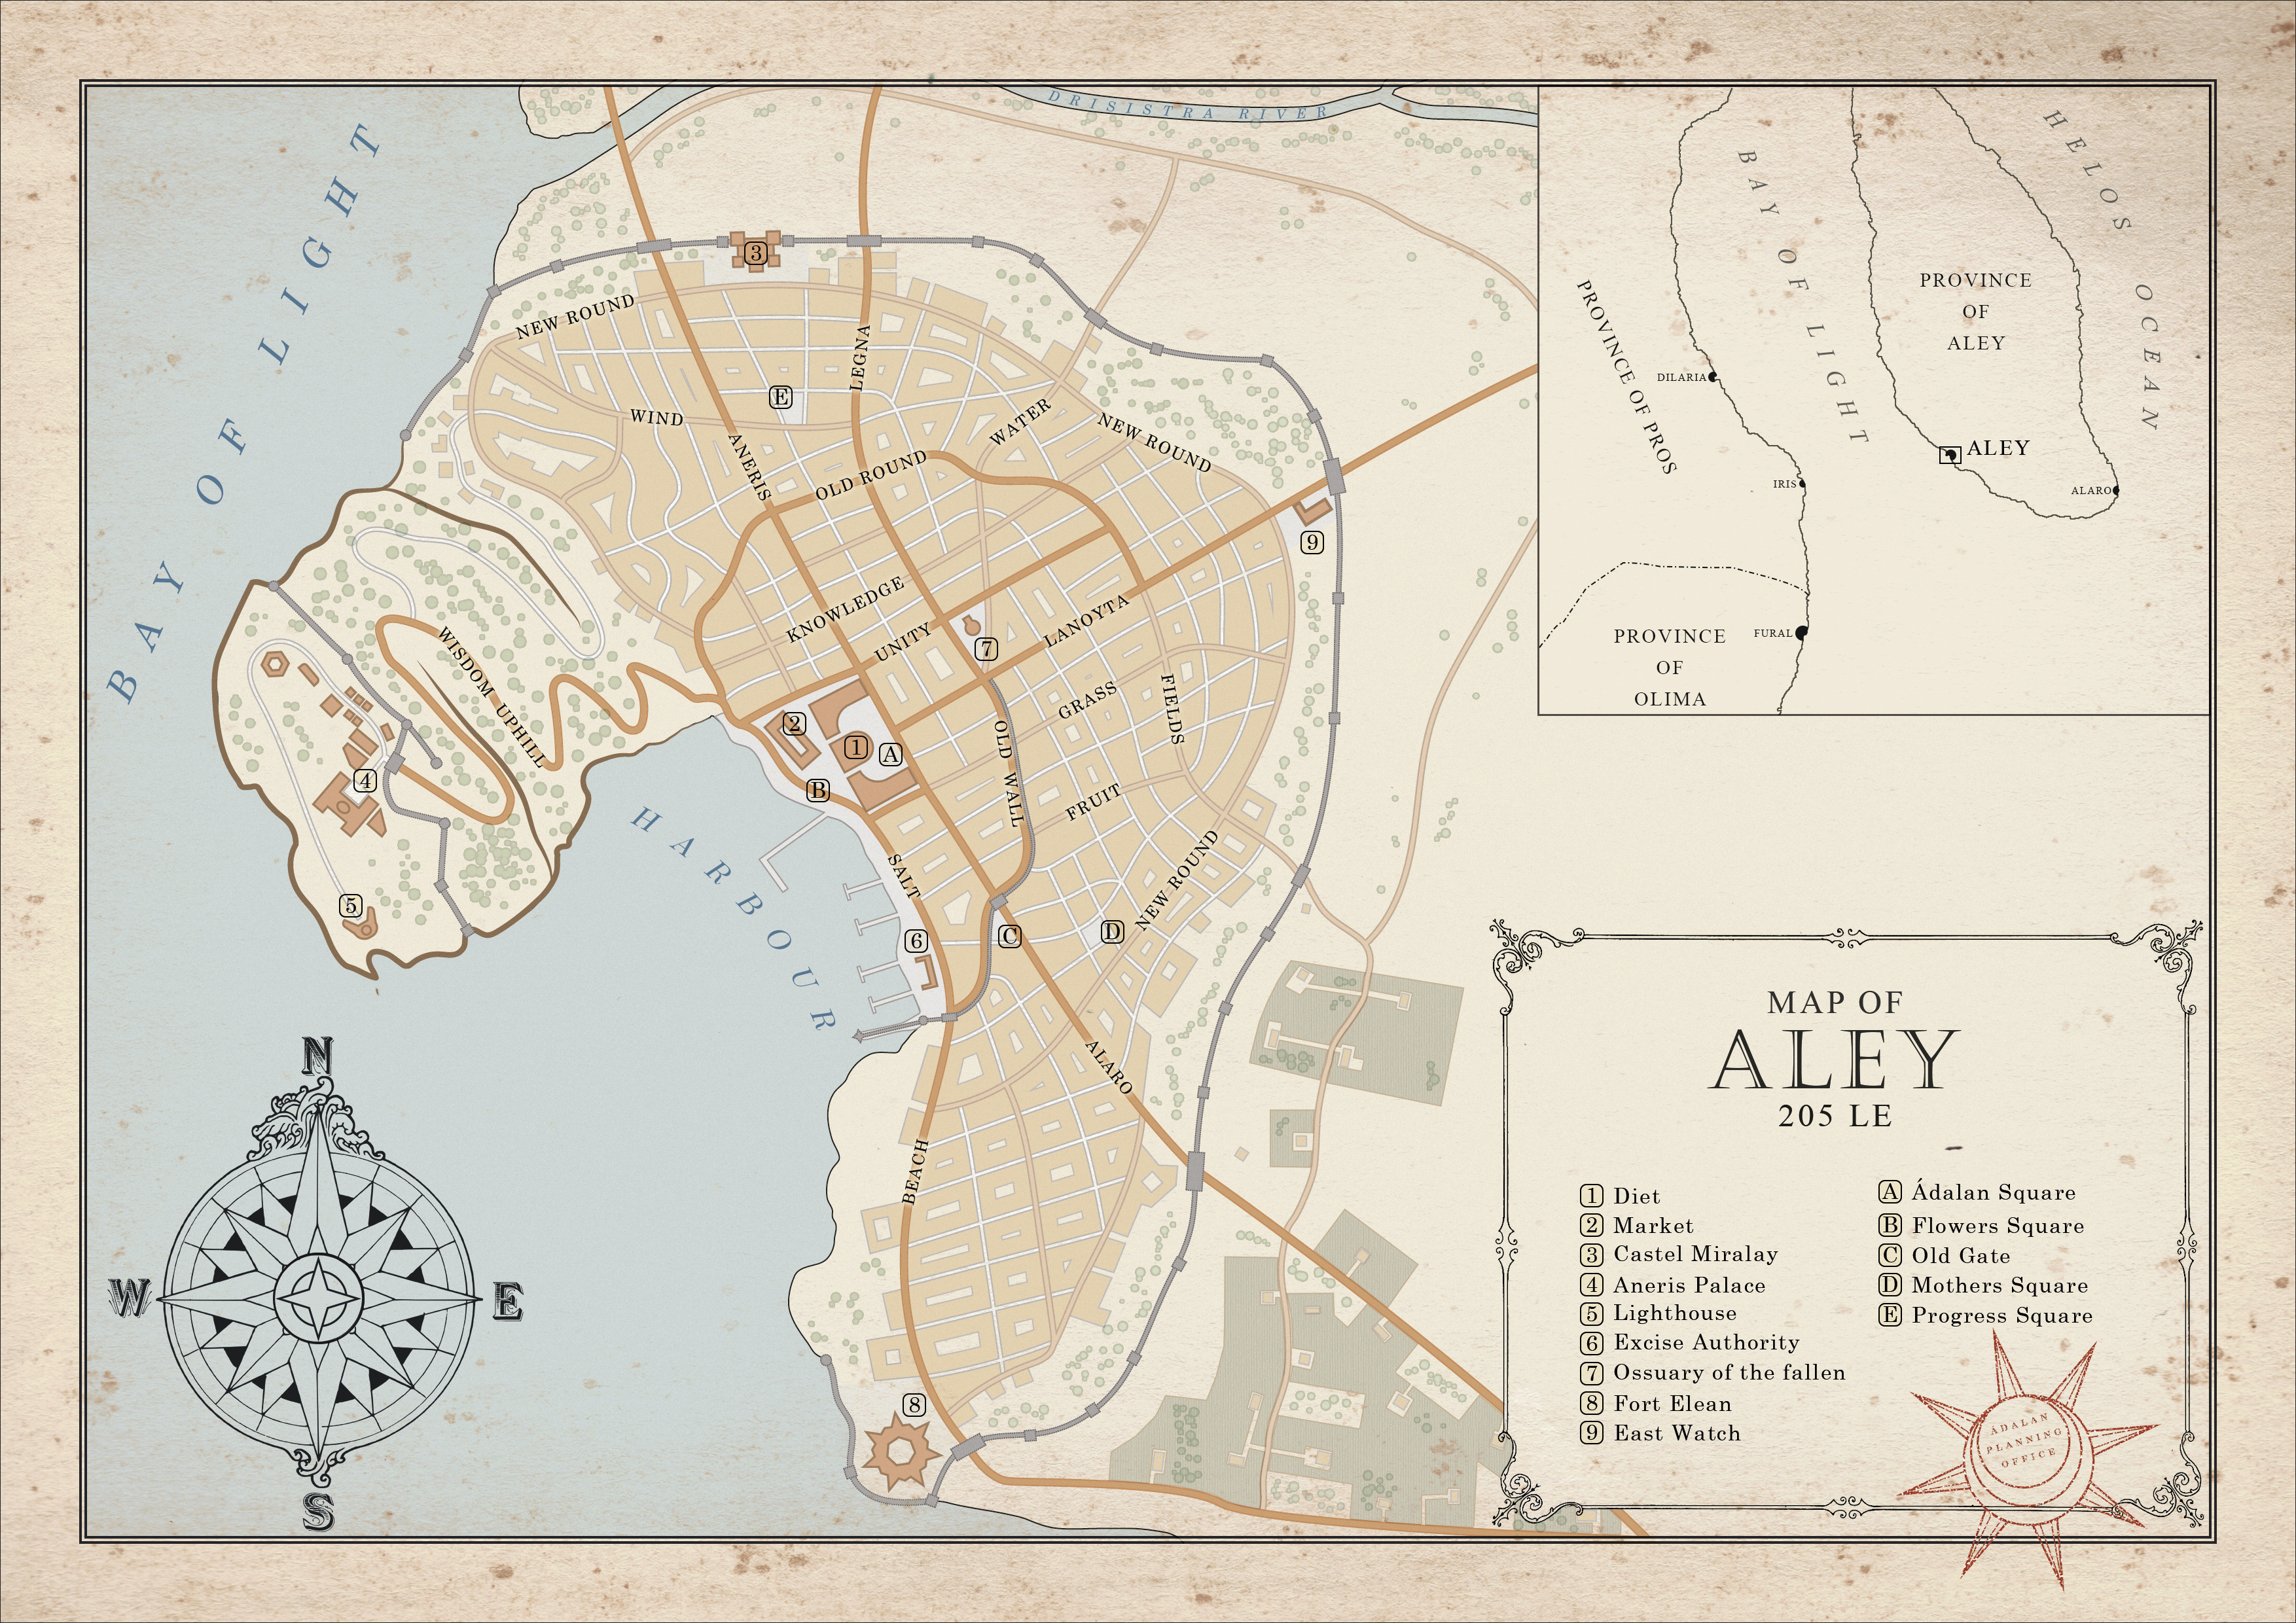 City of Aley by SalesWorlds